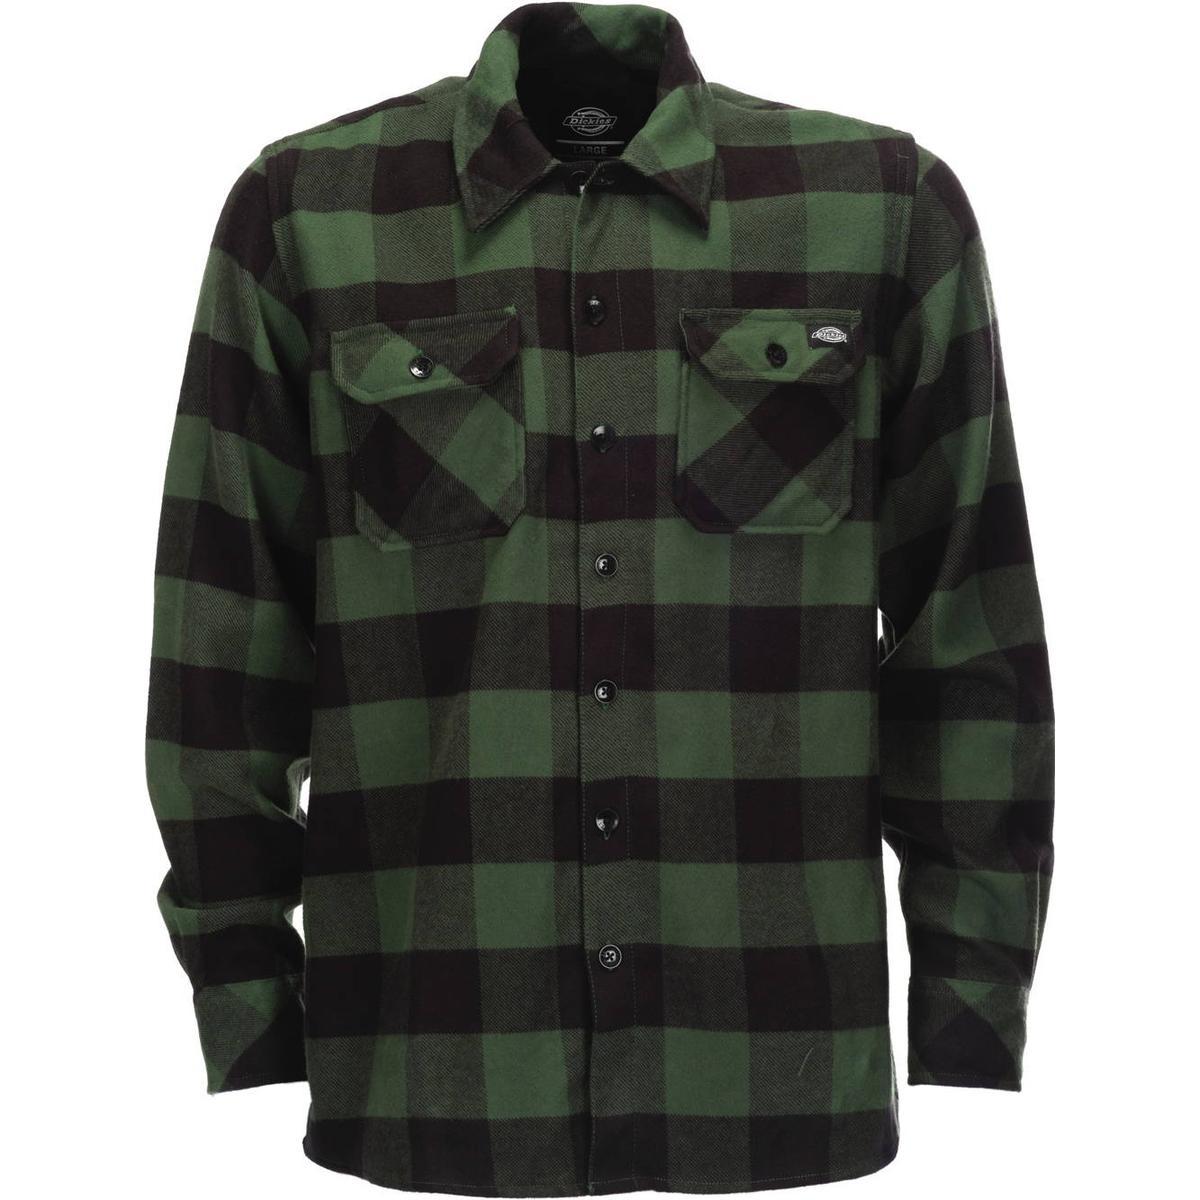 Skjorte xxl Herretøj Sammenlign priser hos PriceRunner